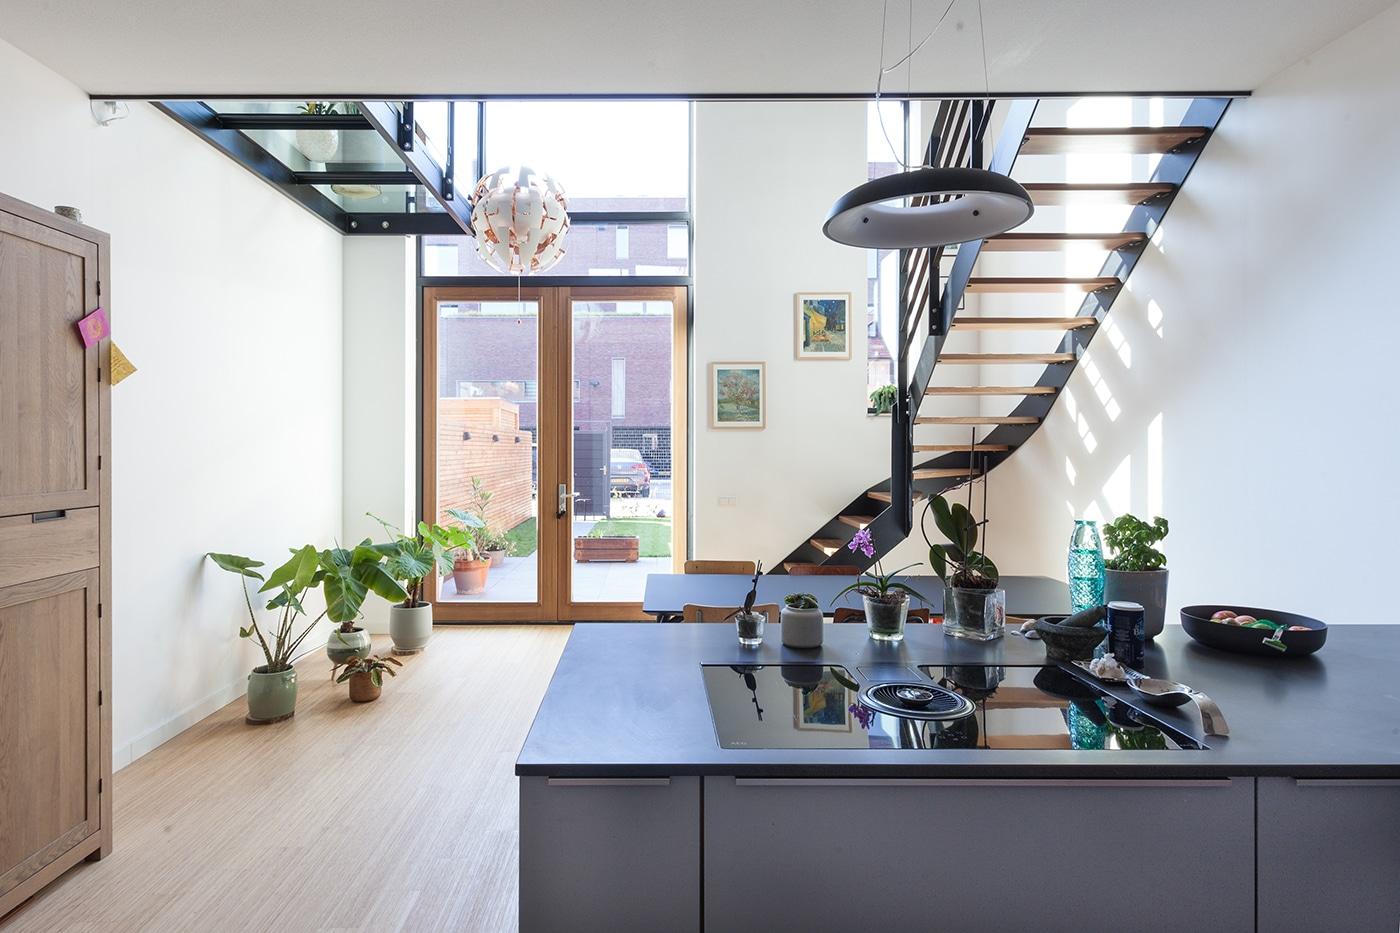 Stadswoning Create@Mullerpier kavel 27 interieur 1 keuken